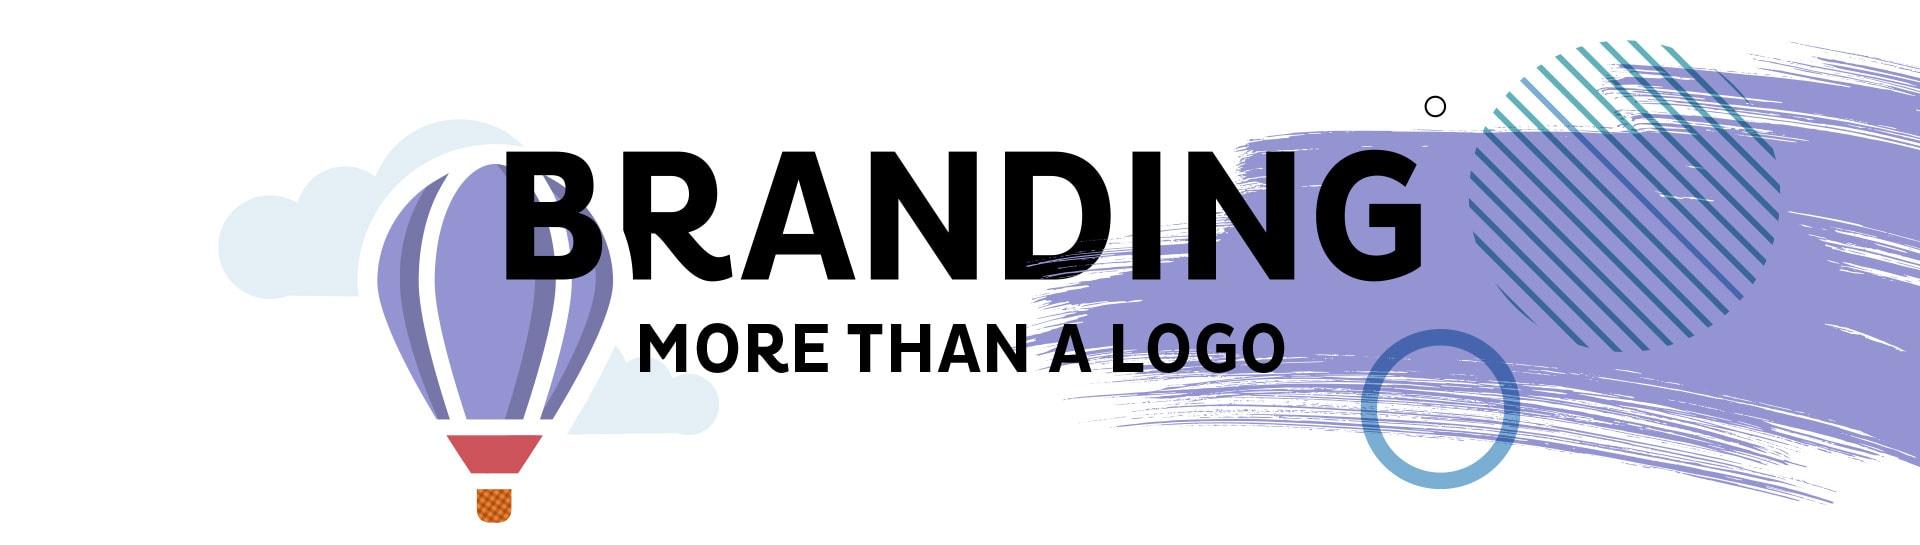 Ocreative-Services_BrandingHeader